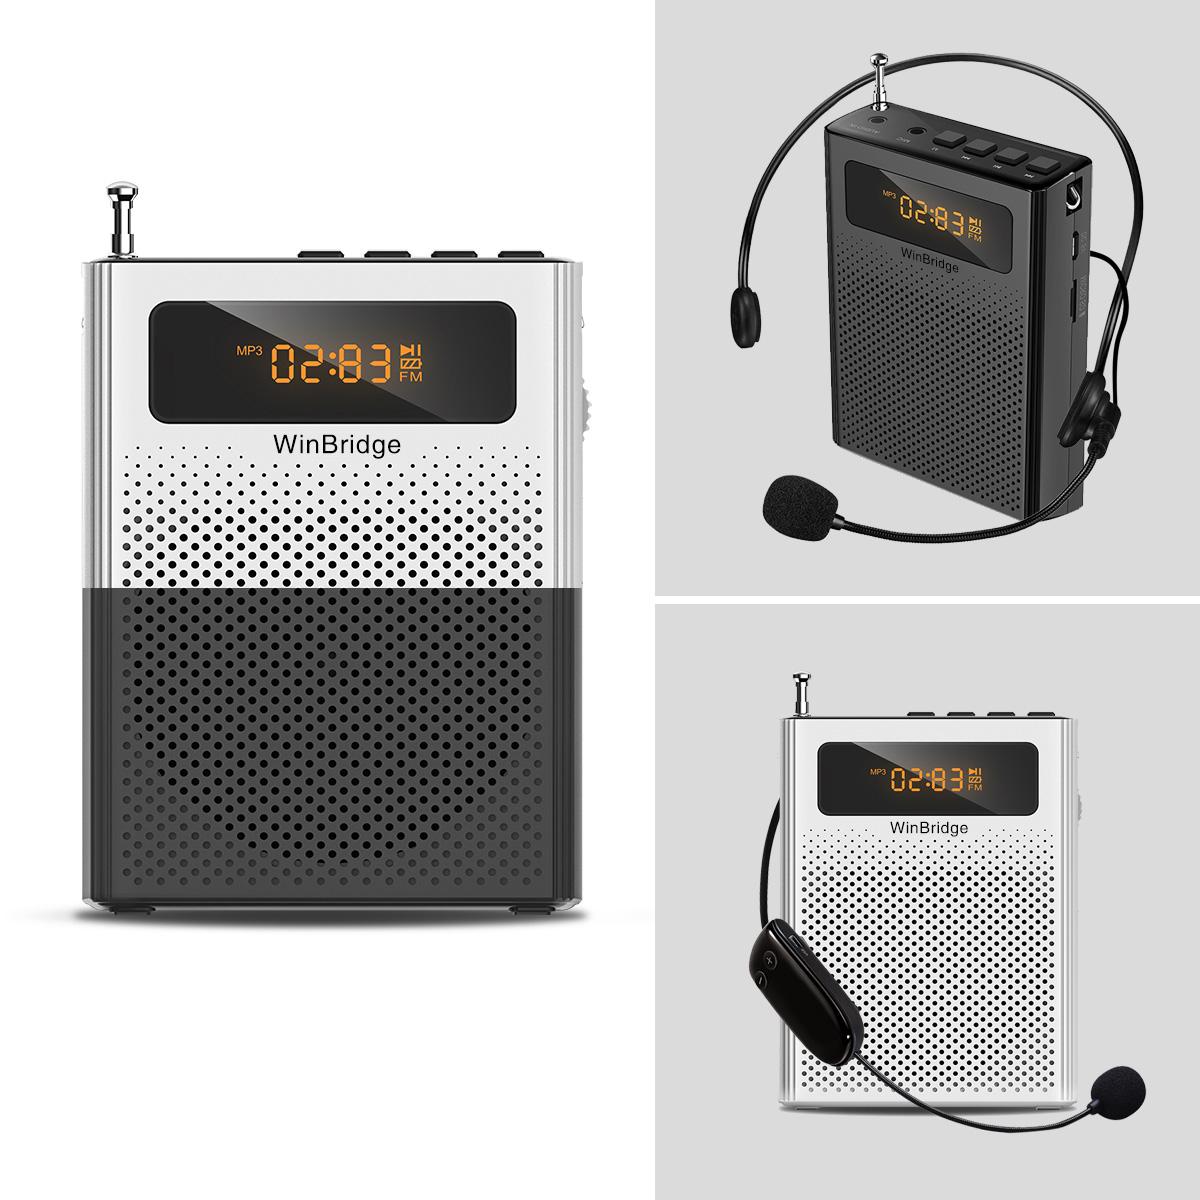 Winbridge winbridge voice amplifier factory for sale-8